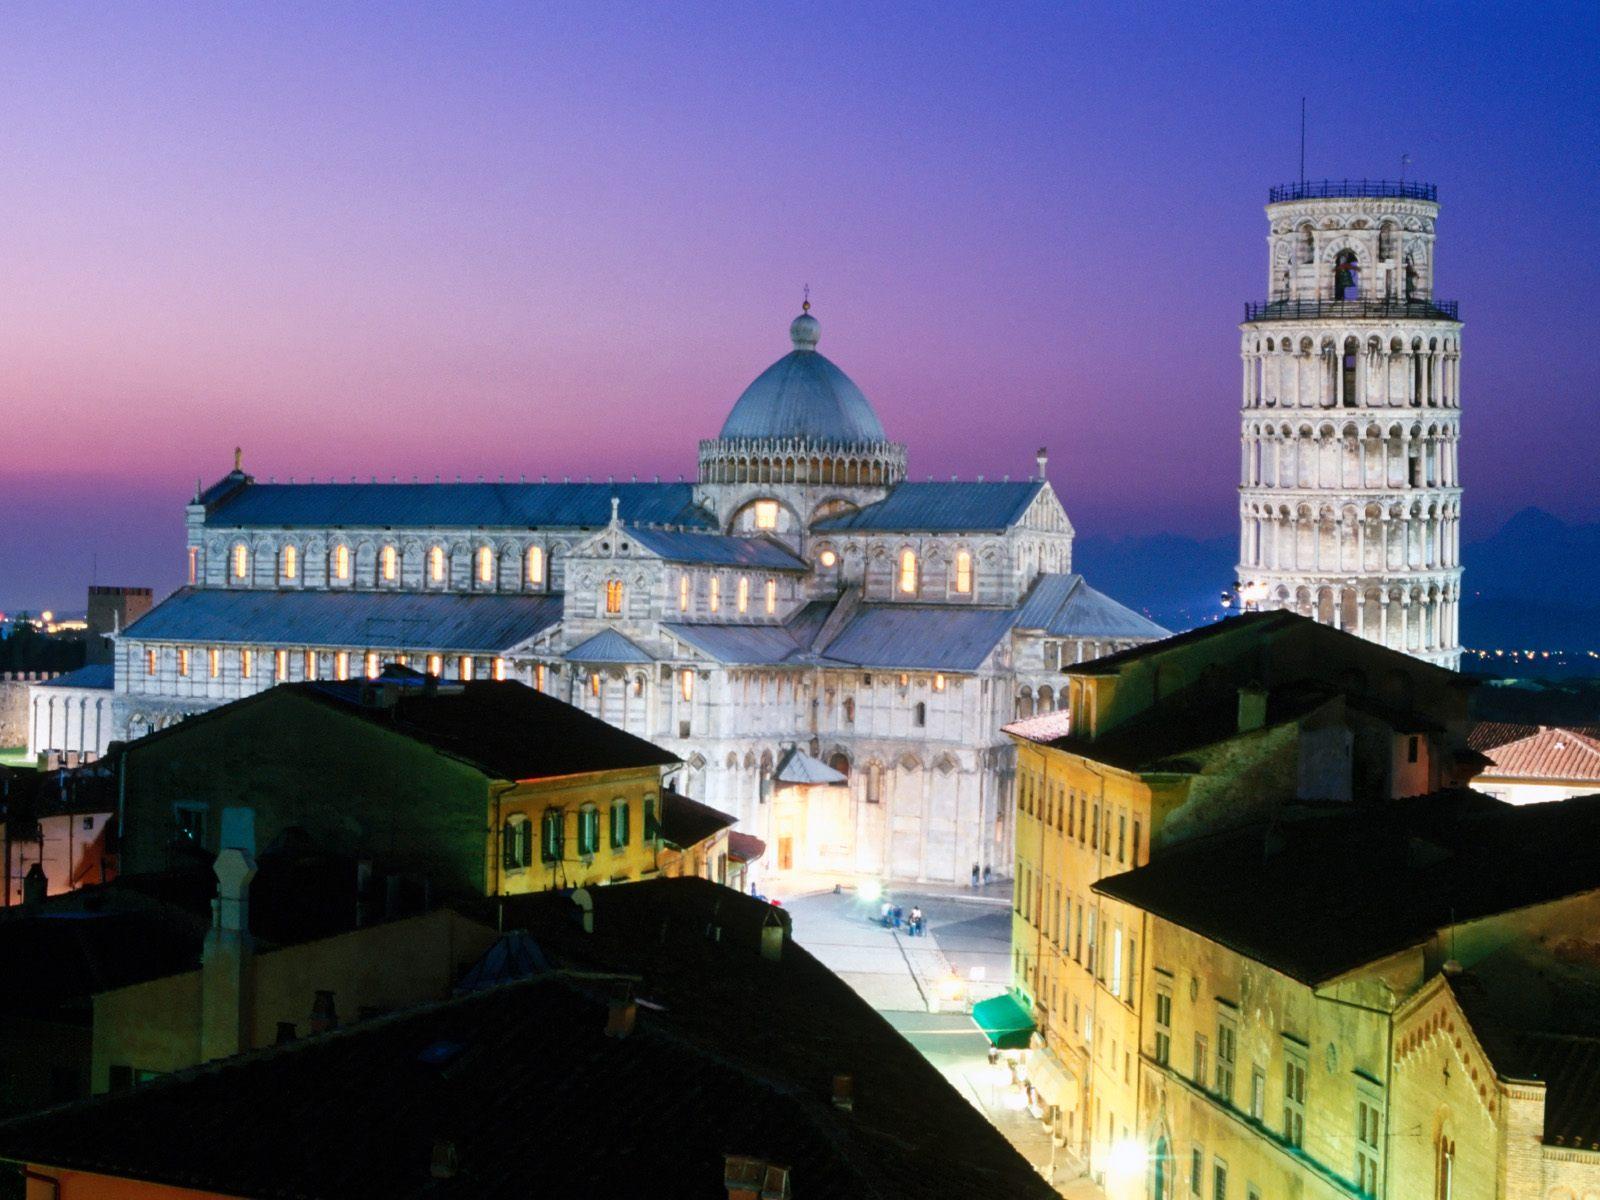 http://2.bp.blogspot.com/-3MHfdWlHaQY/Tcp4PNYwBdI/AAAAAAAACXc/lyEuDAwsvYI/s1600/Piazza+dei+Miracoli%252C+Pisa%252C+Italy.jpg